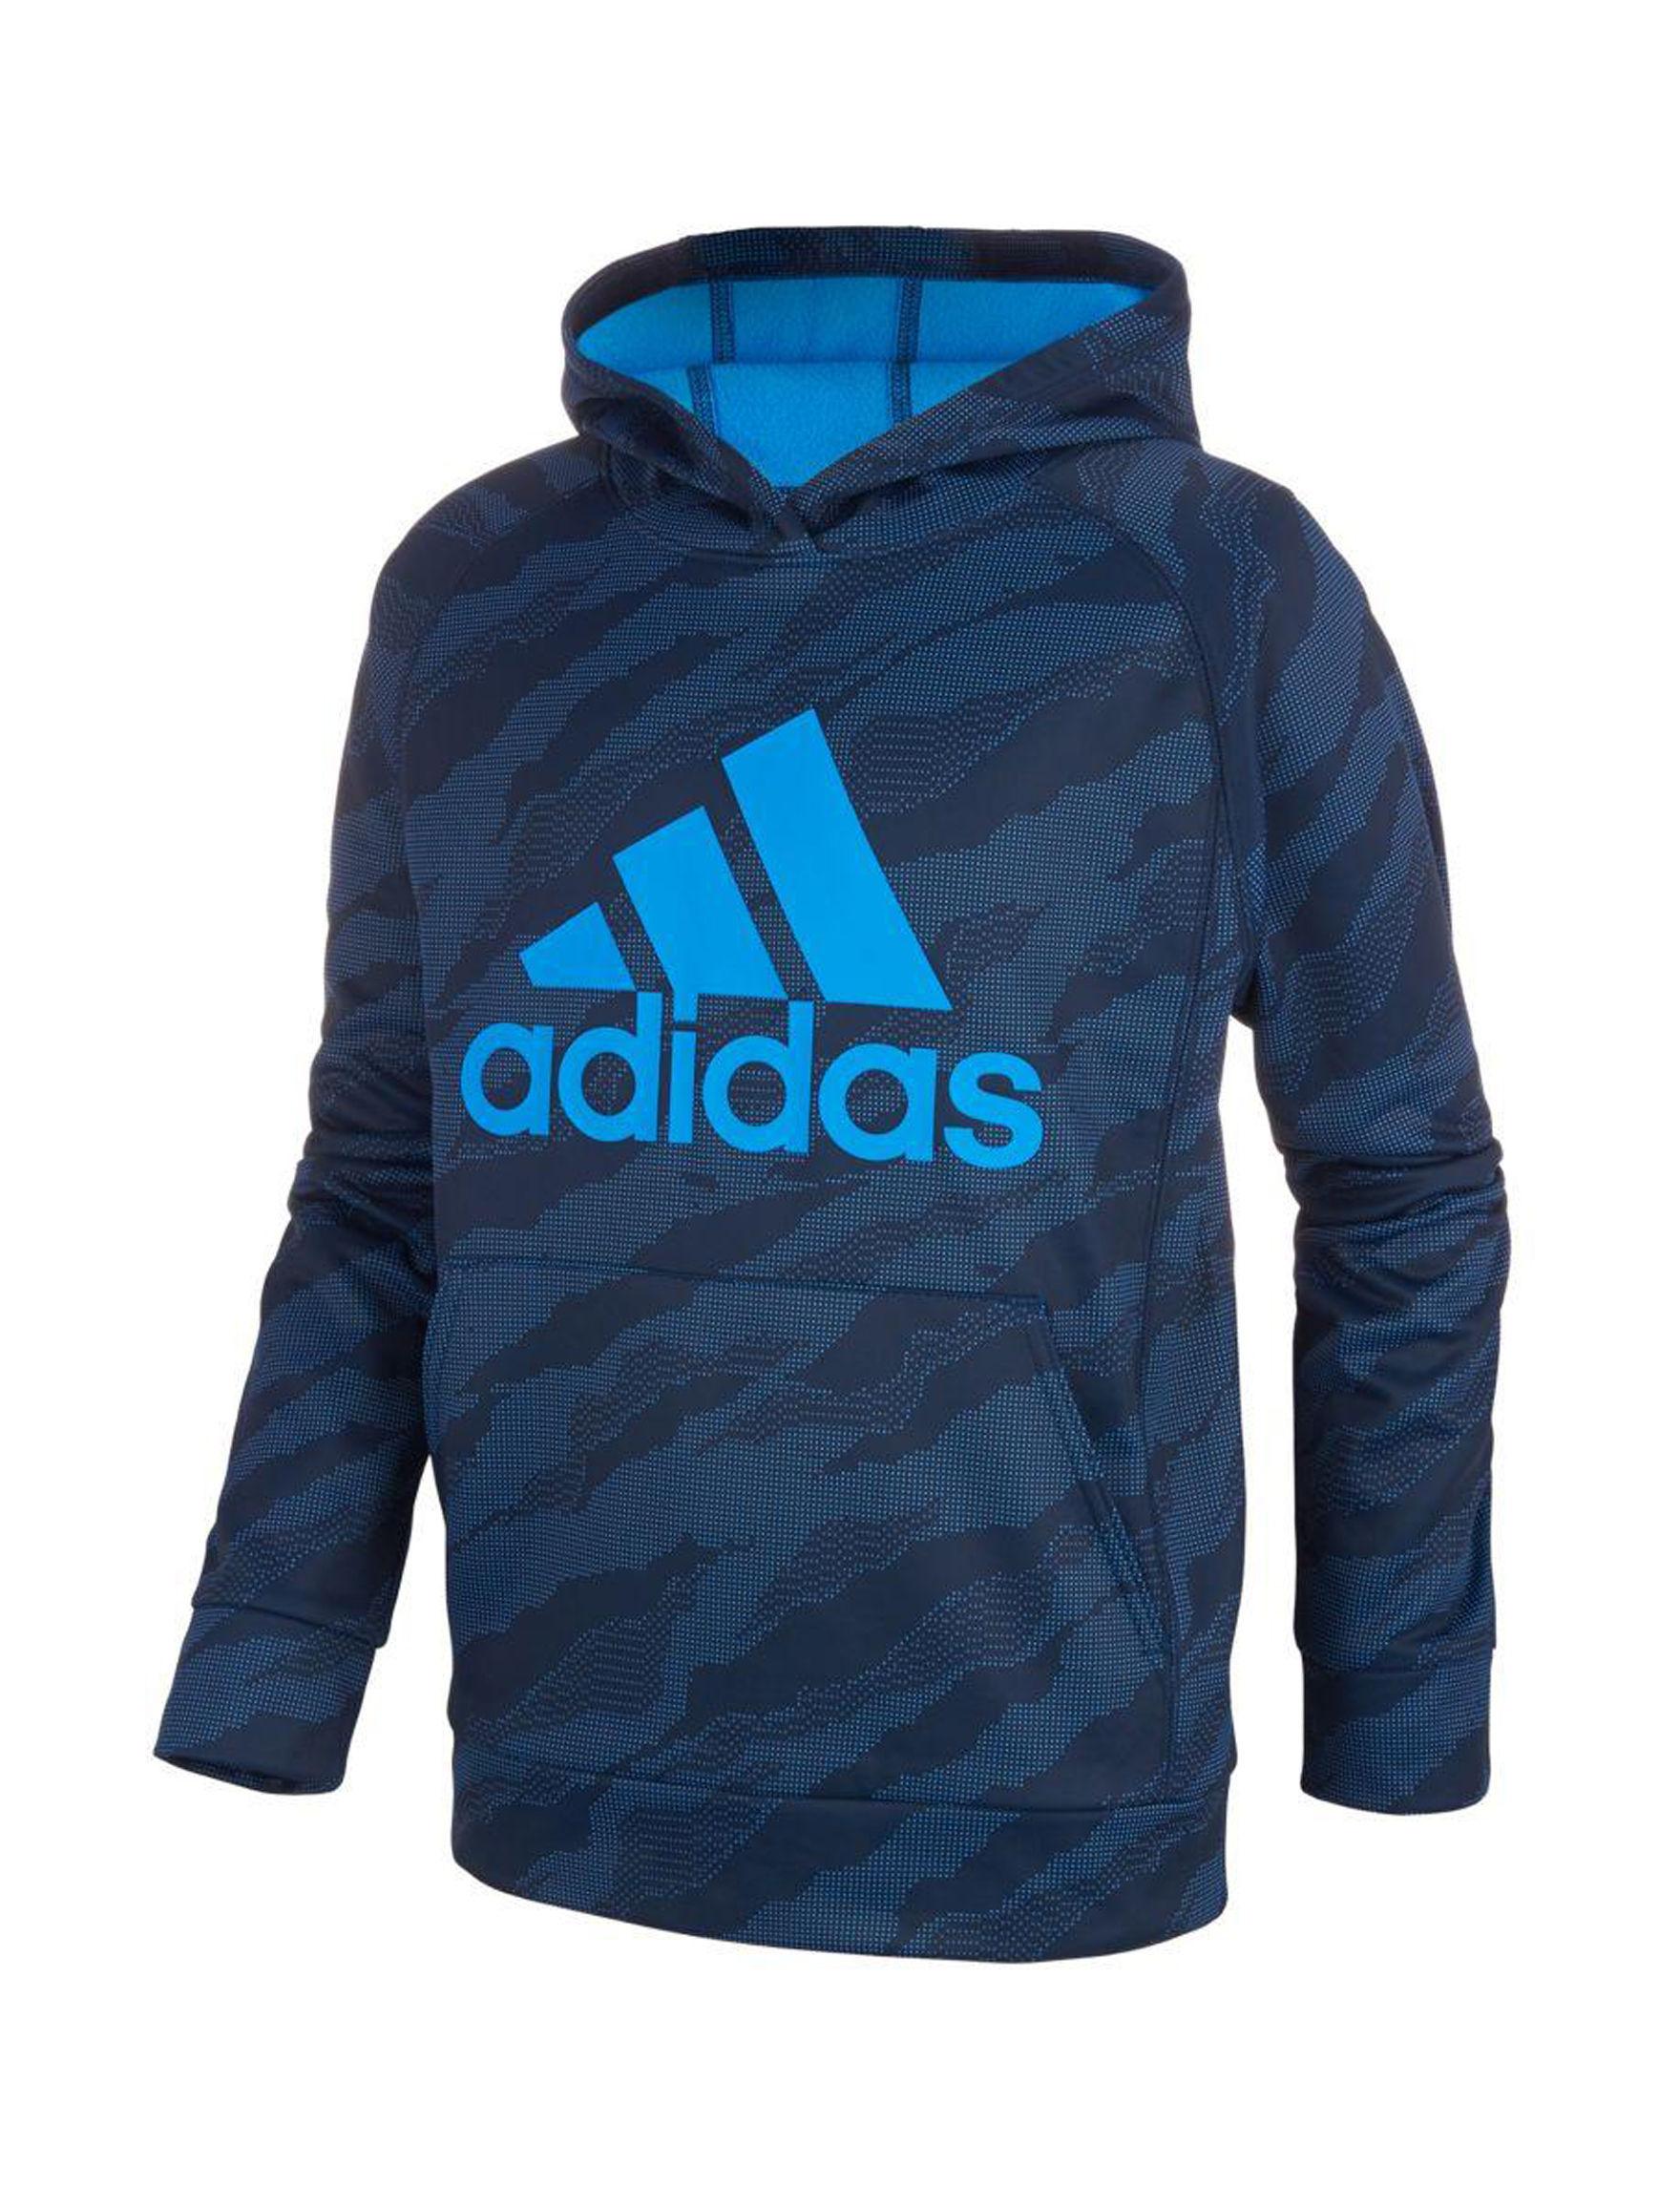 Adidas Navy / Blue